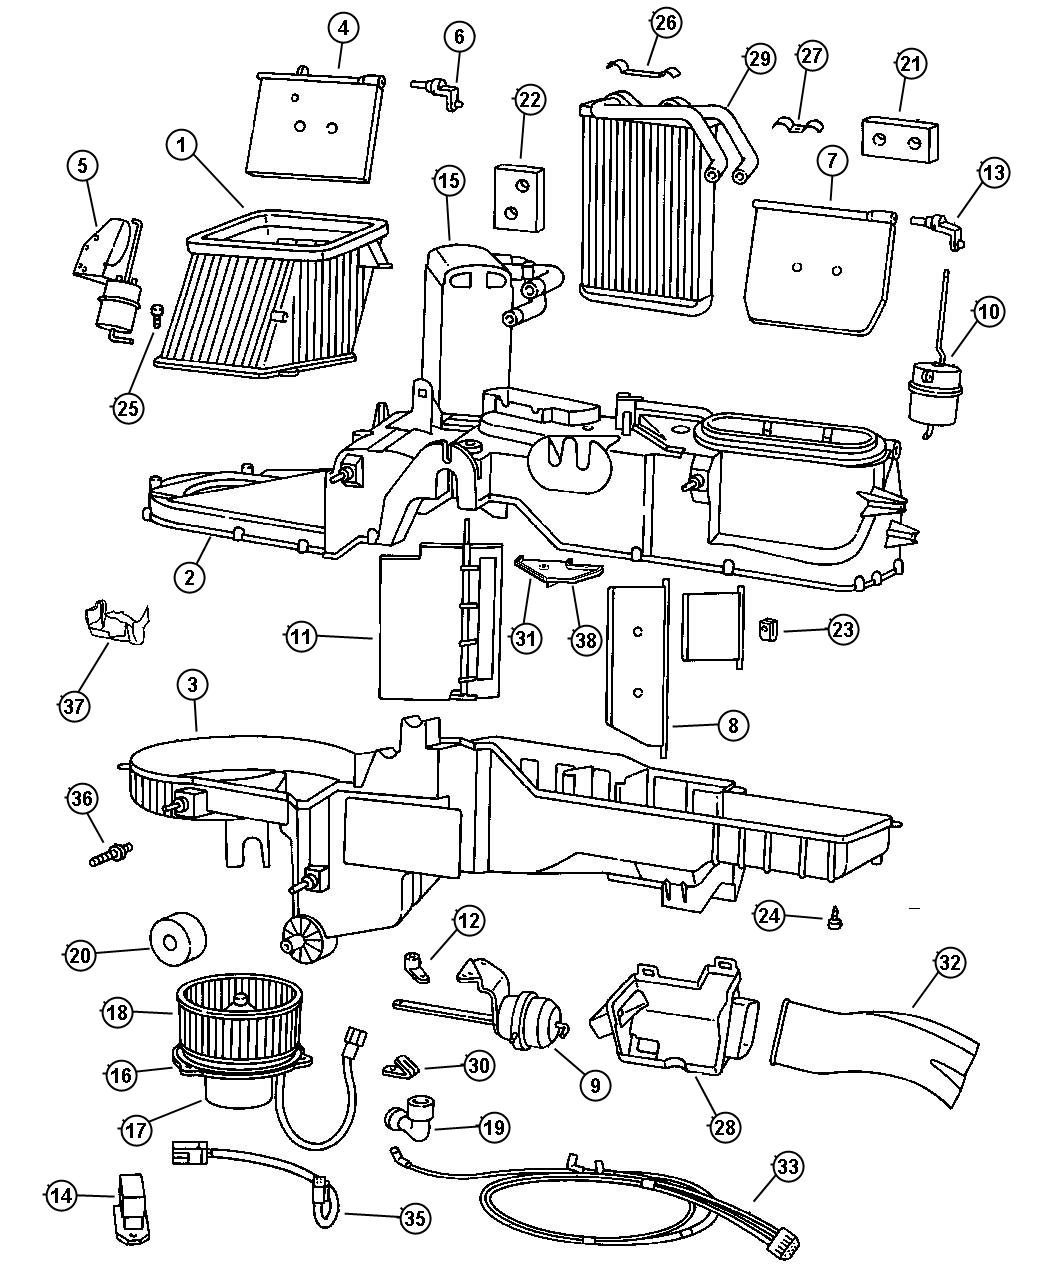 Air Conditioner Unit: Air Conditioner Unit With Heater